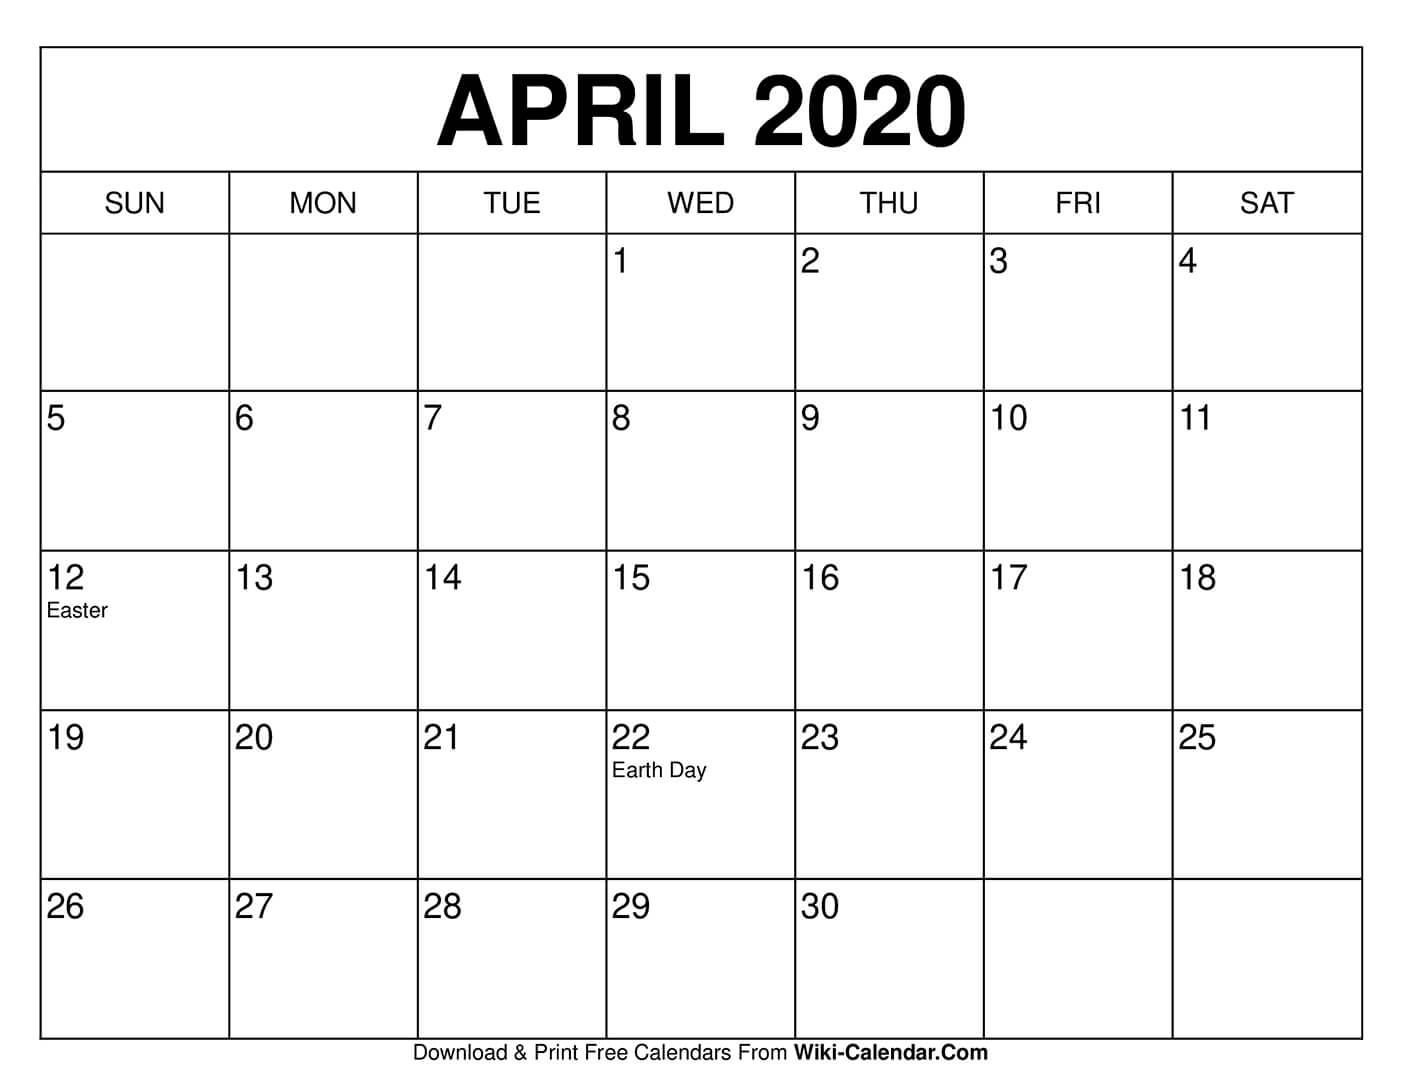 Take No Download Free Printable Calendar